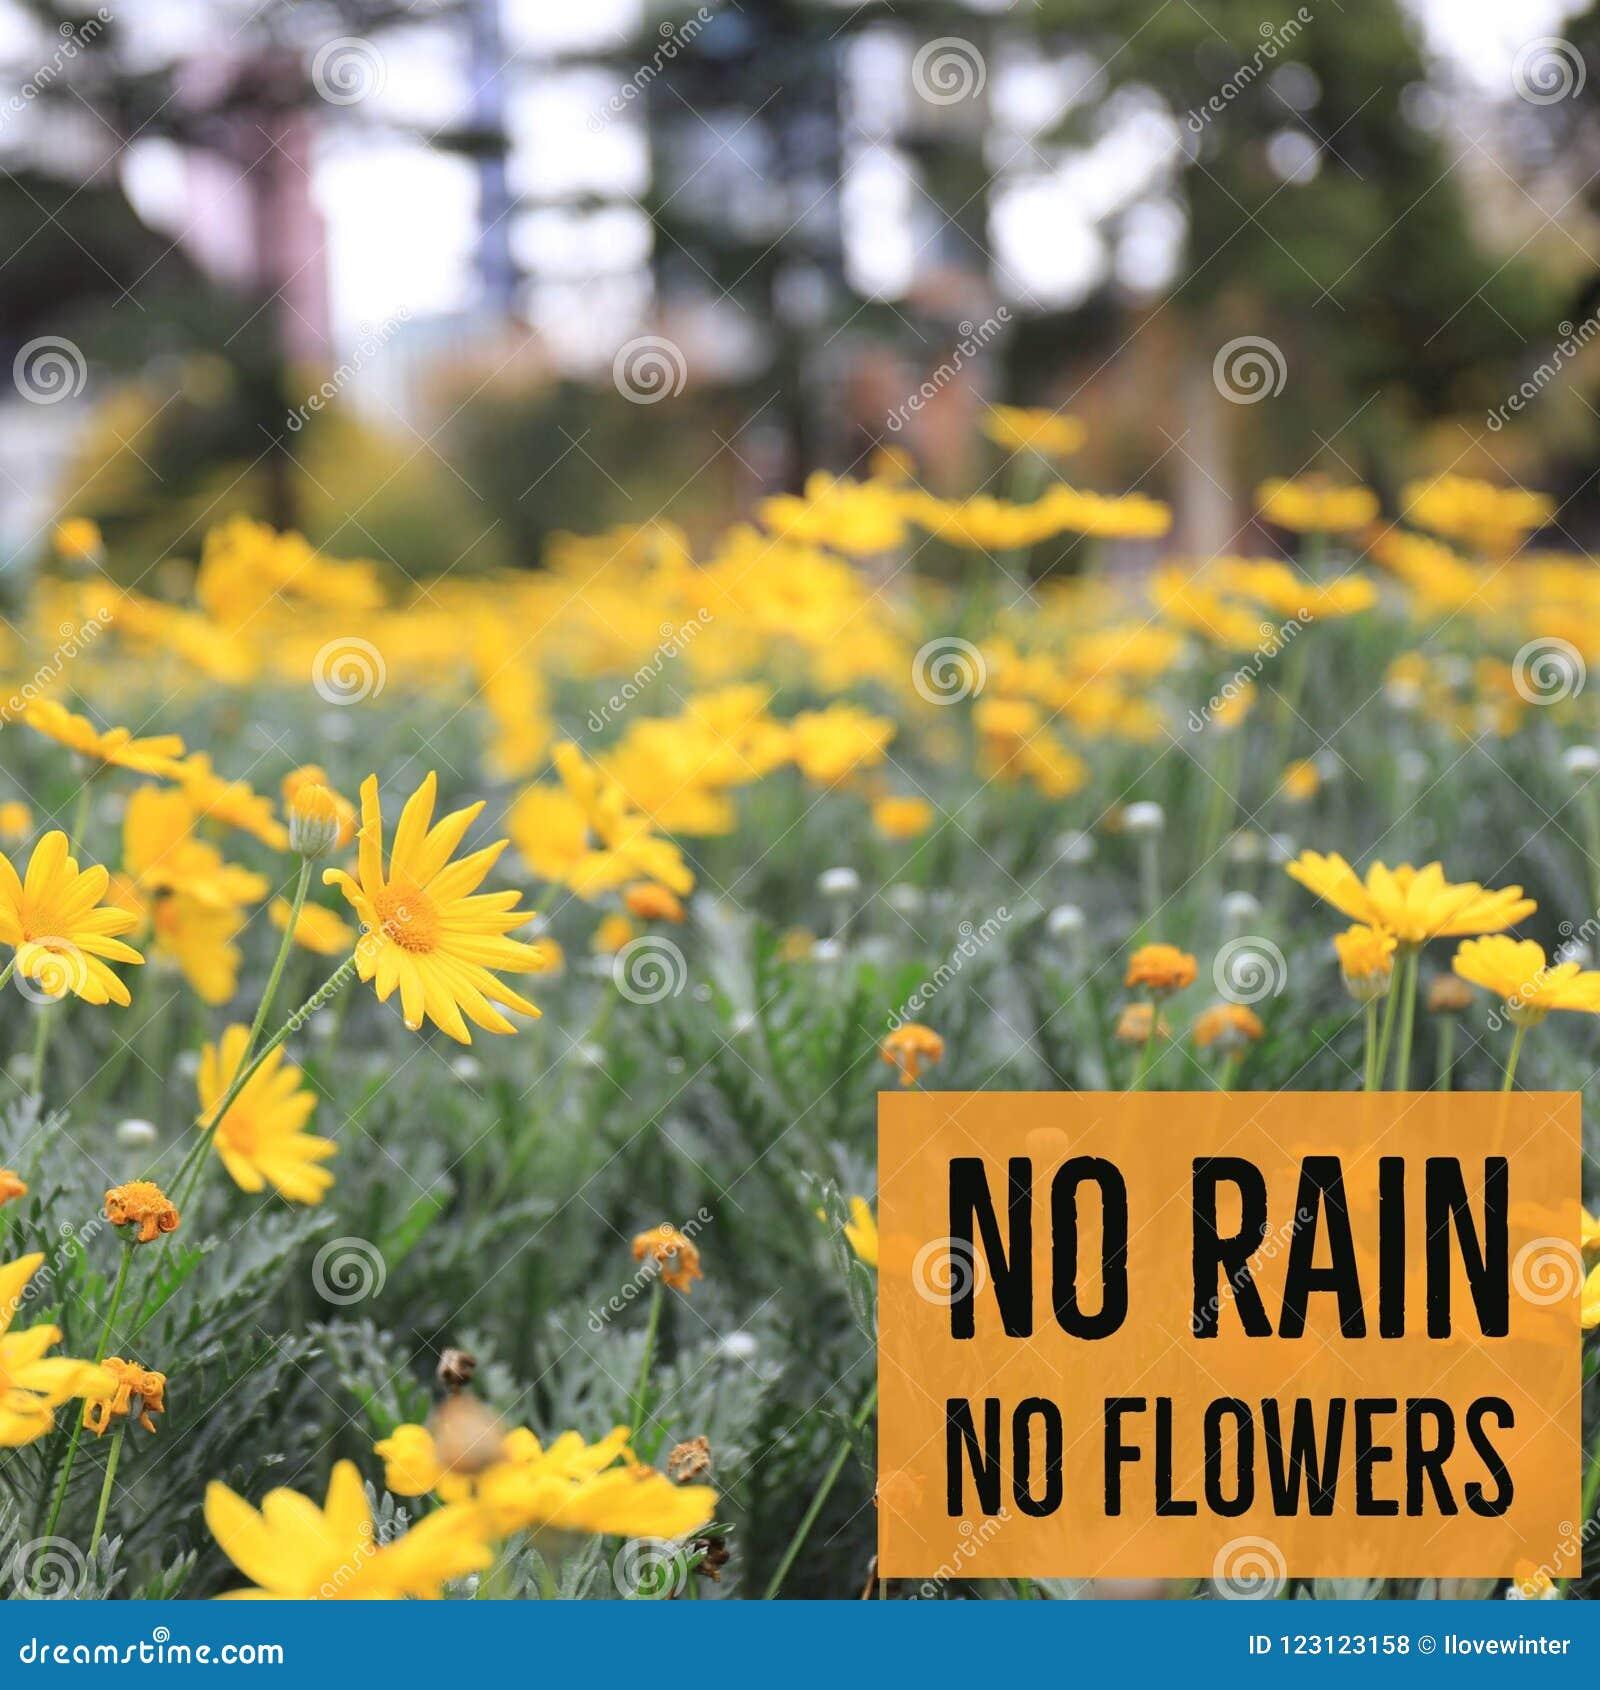 Inspirational Motivational Quote No Rain No Flowers Stock Photo